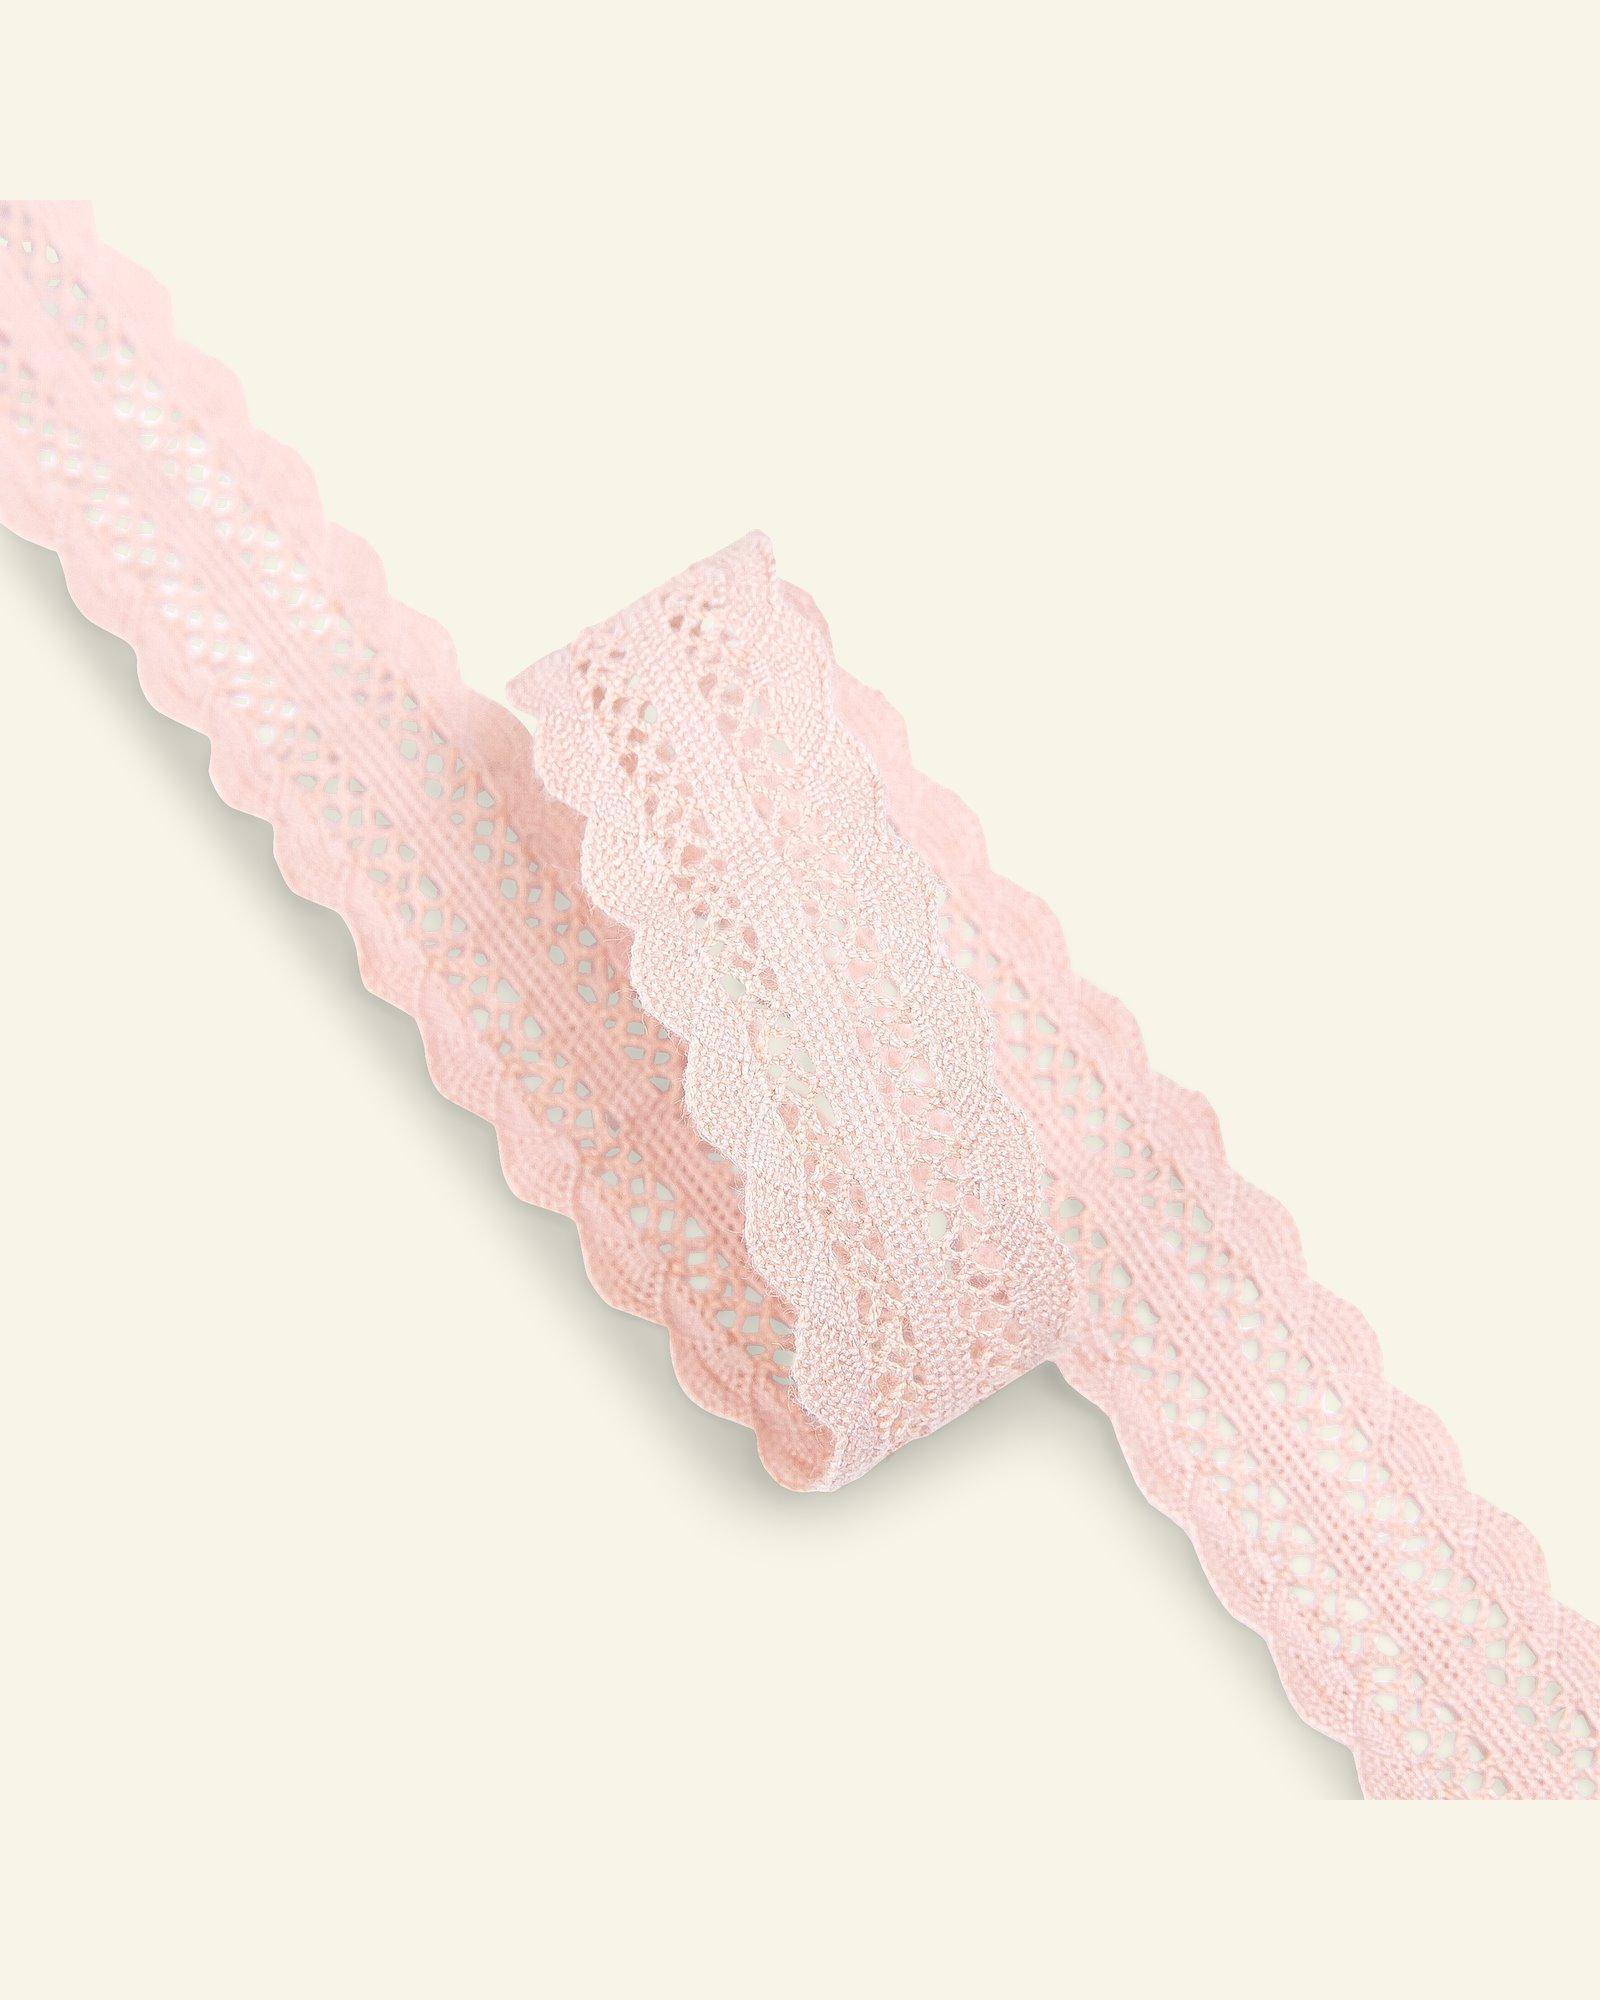 Lace cotton 22mm light dusty rose 1,5m